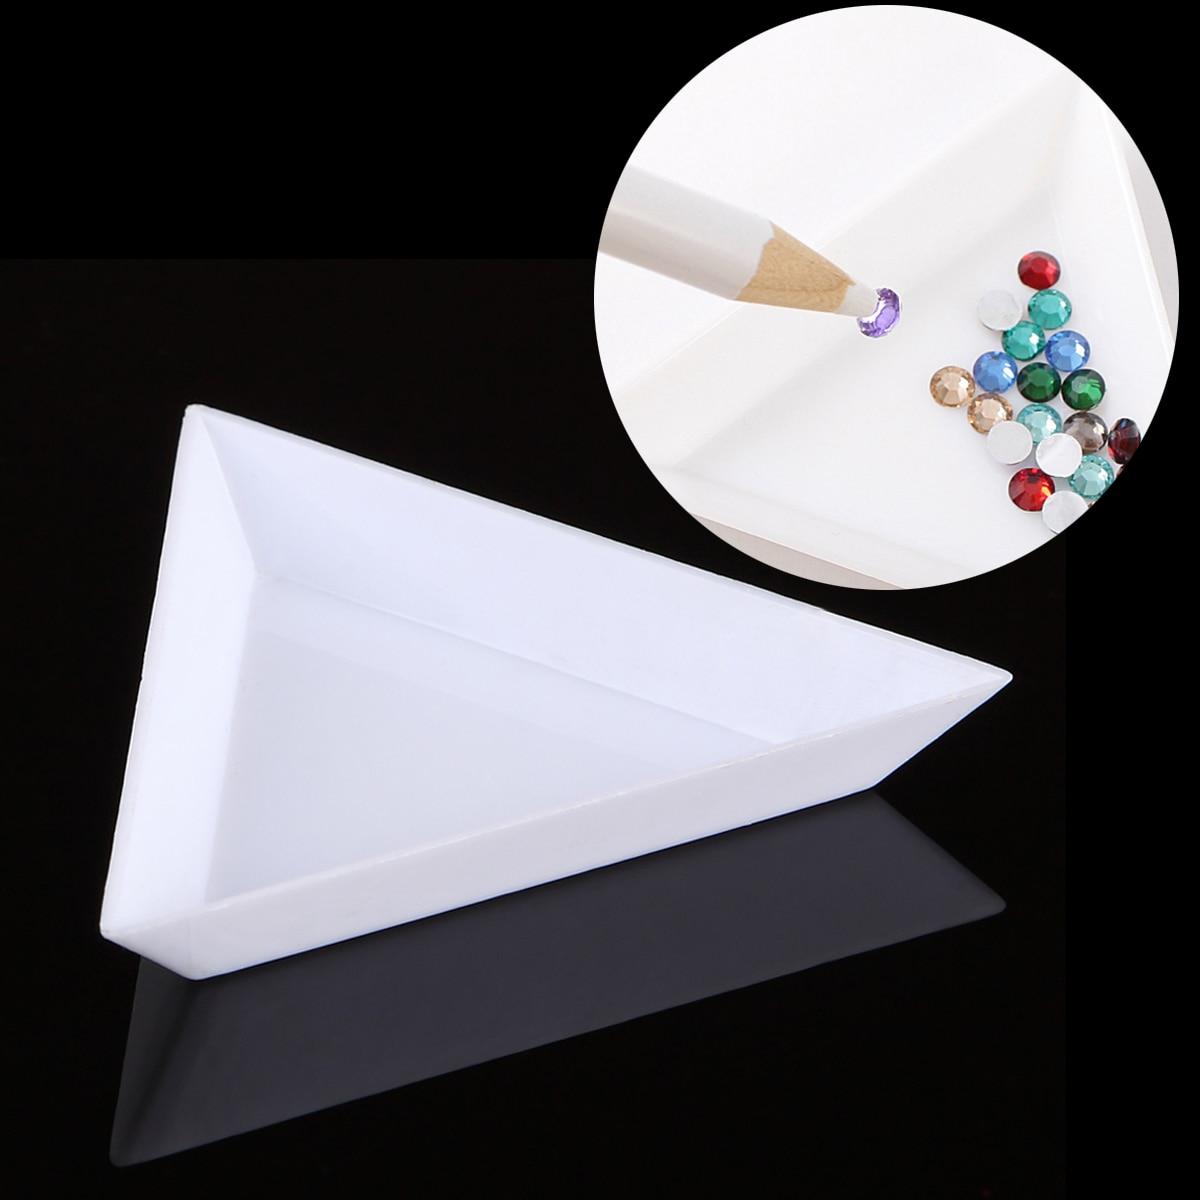 1 Pc Triangle Plastic Nail Art Gem Diamond Glitter Crystal Sorting Trays Rhinestones Beads Decor Picker Storage Accessory White